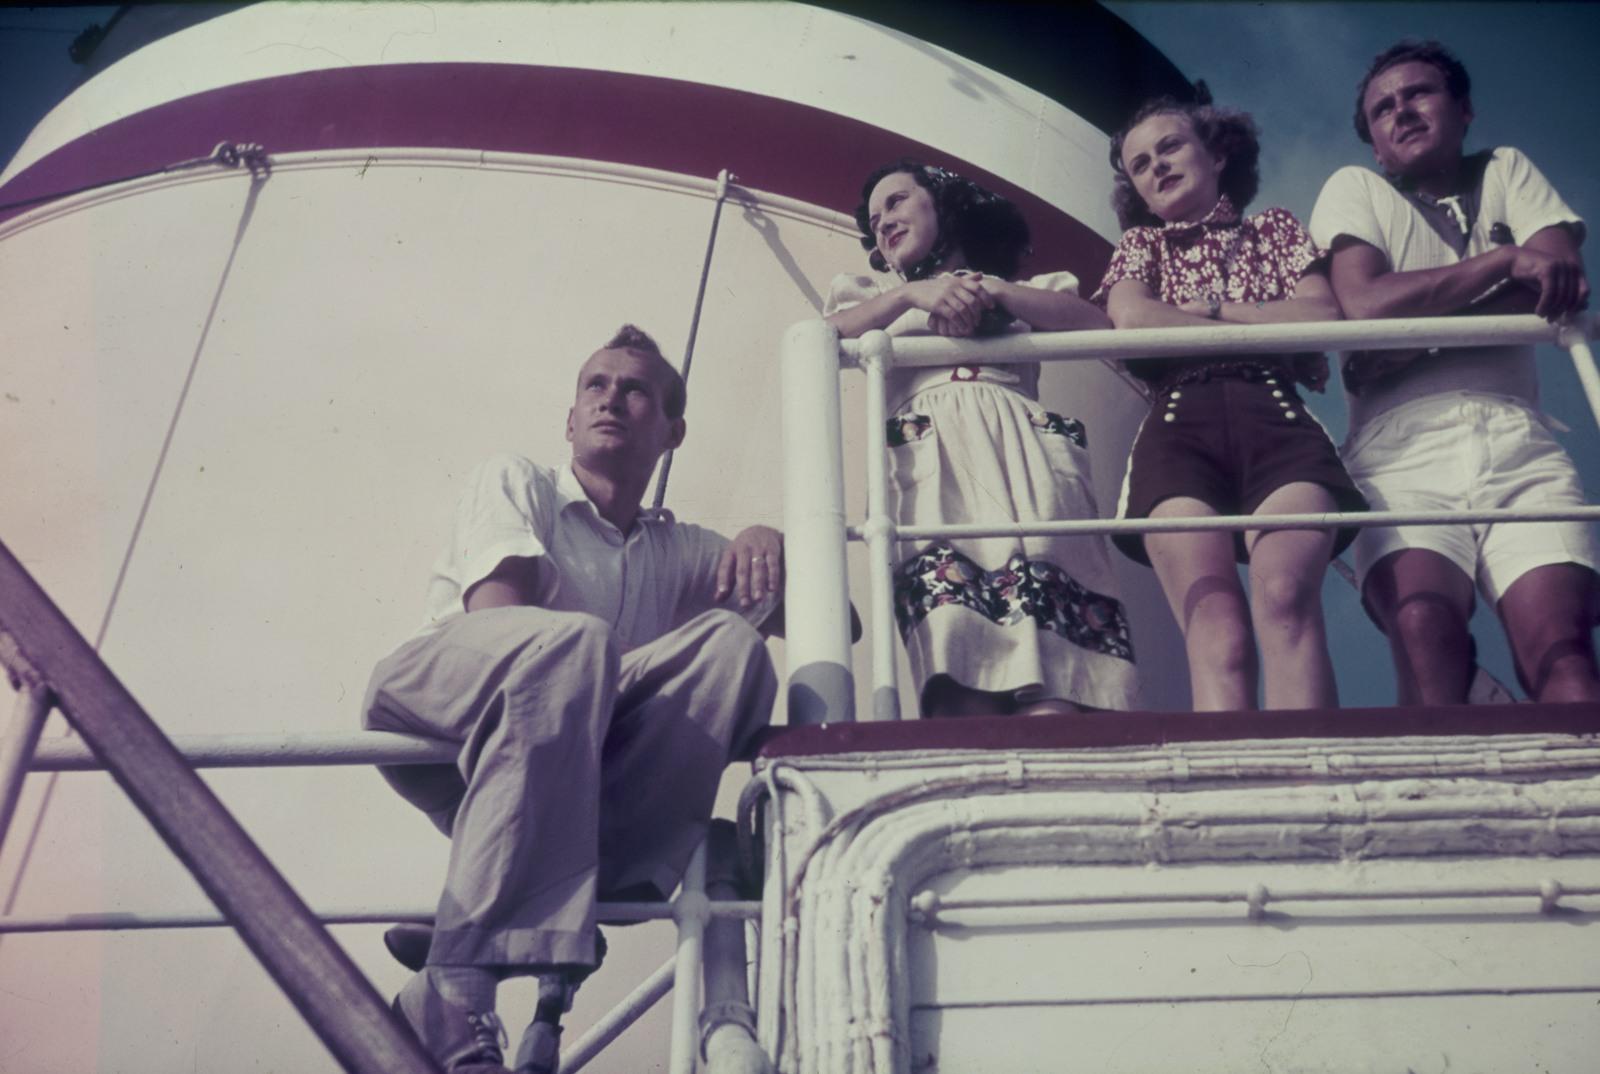 Две пары на палубе пассажирского судна